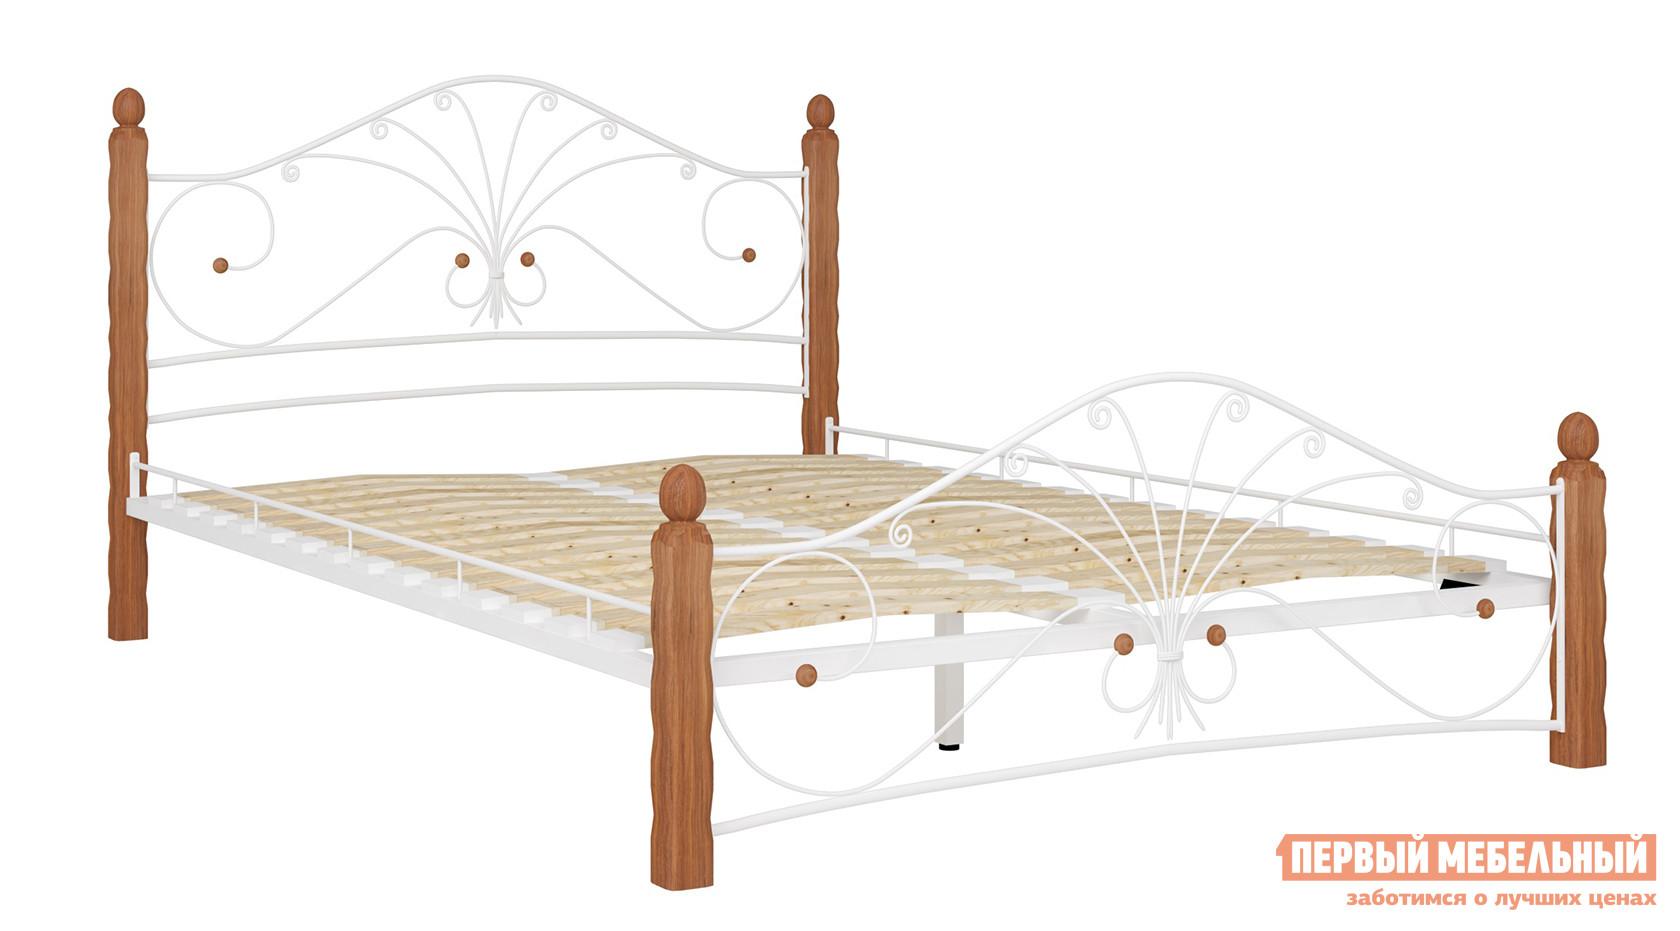 Односпальная кровать  Сандра Белый металл, каркас / Махагон массив, опоры, 120х200 см